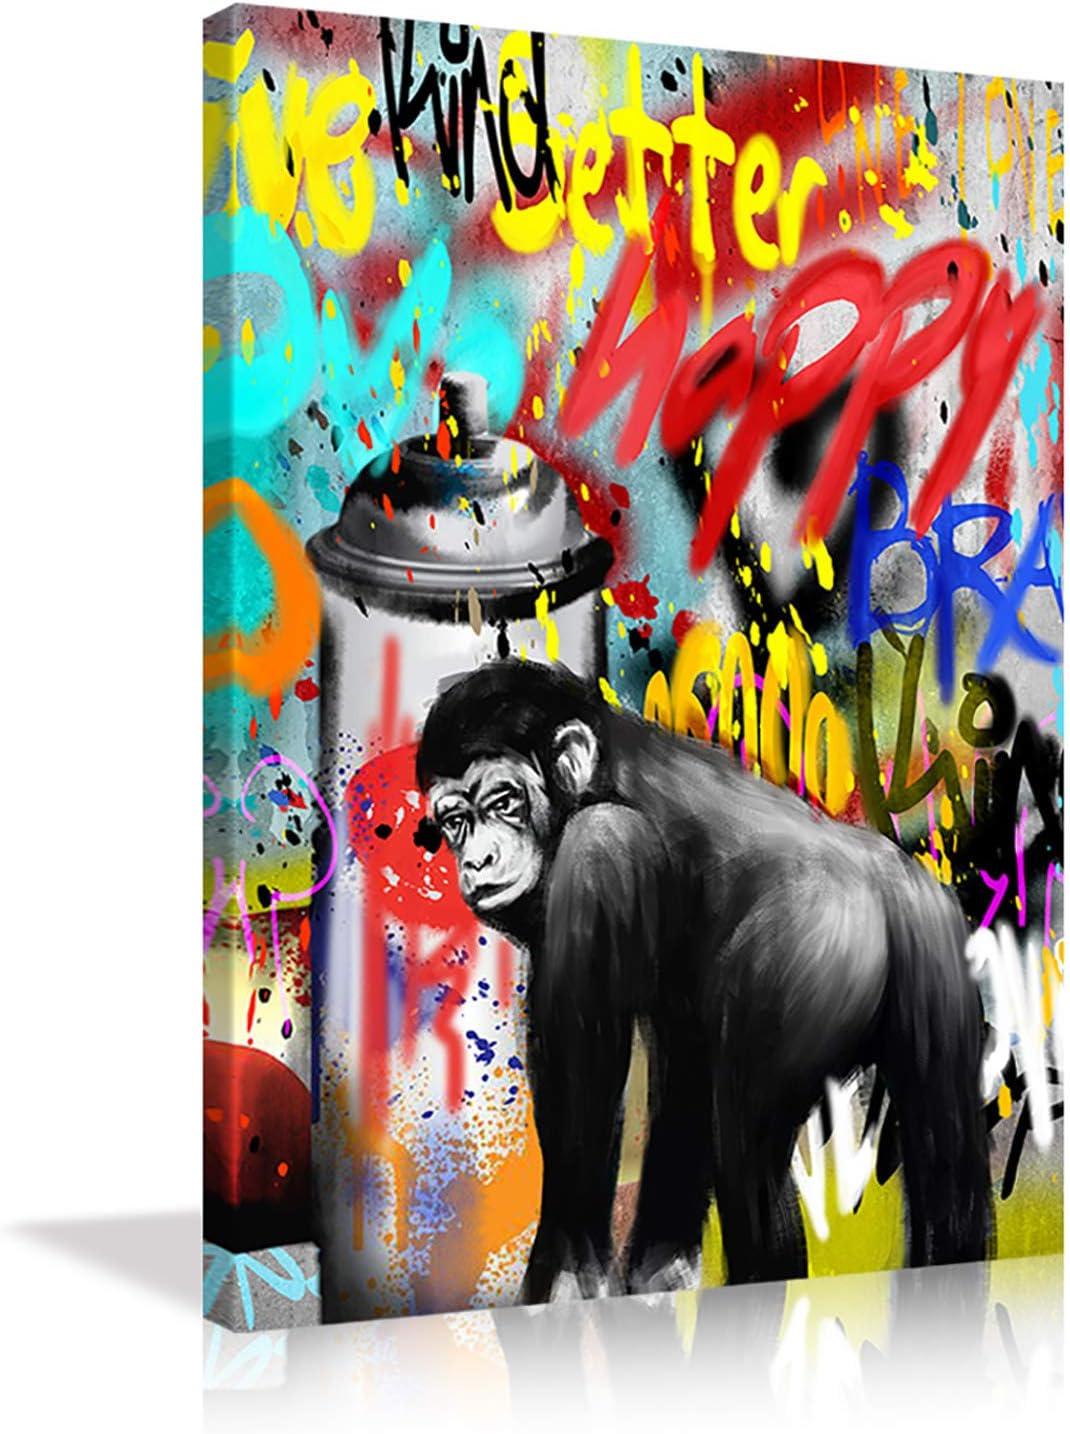 AMEMNY Art 贈呈 King Kong Orangutan Abstract Pop Paintings SALENEW大人気 Graffi